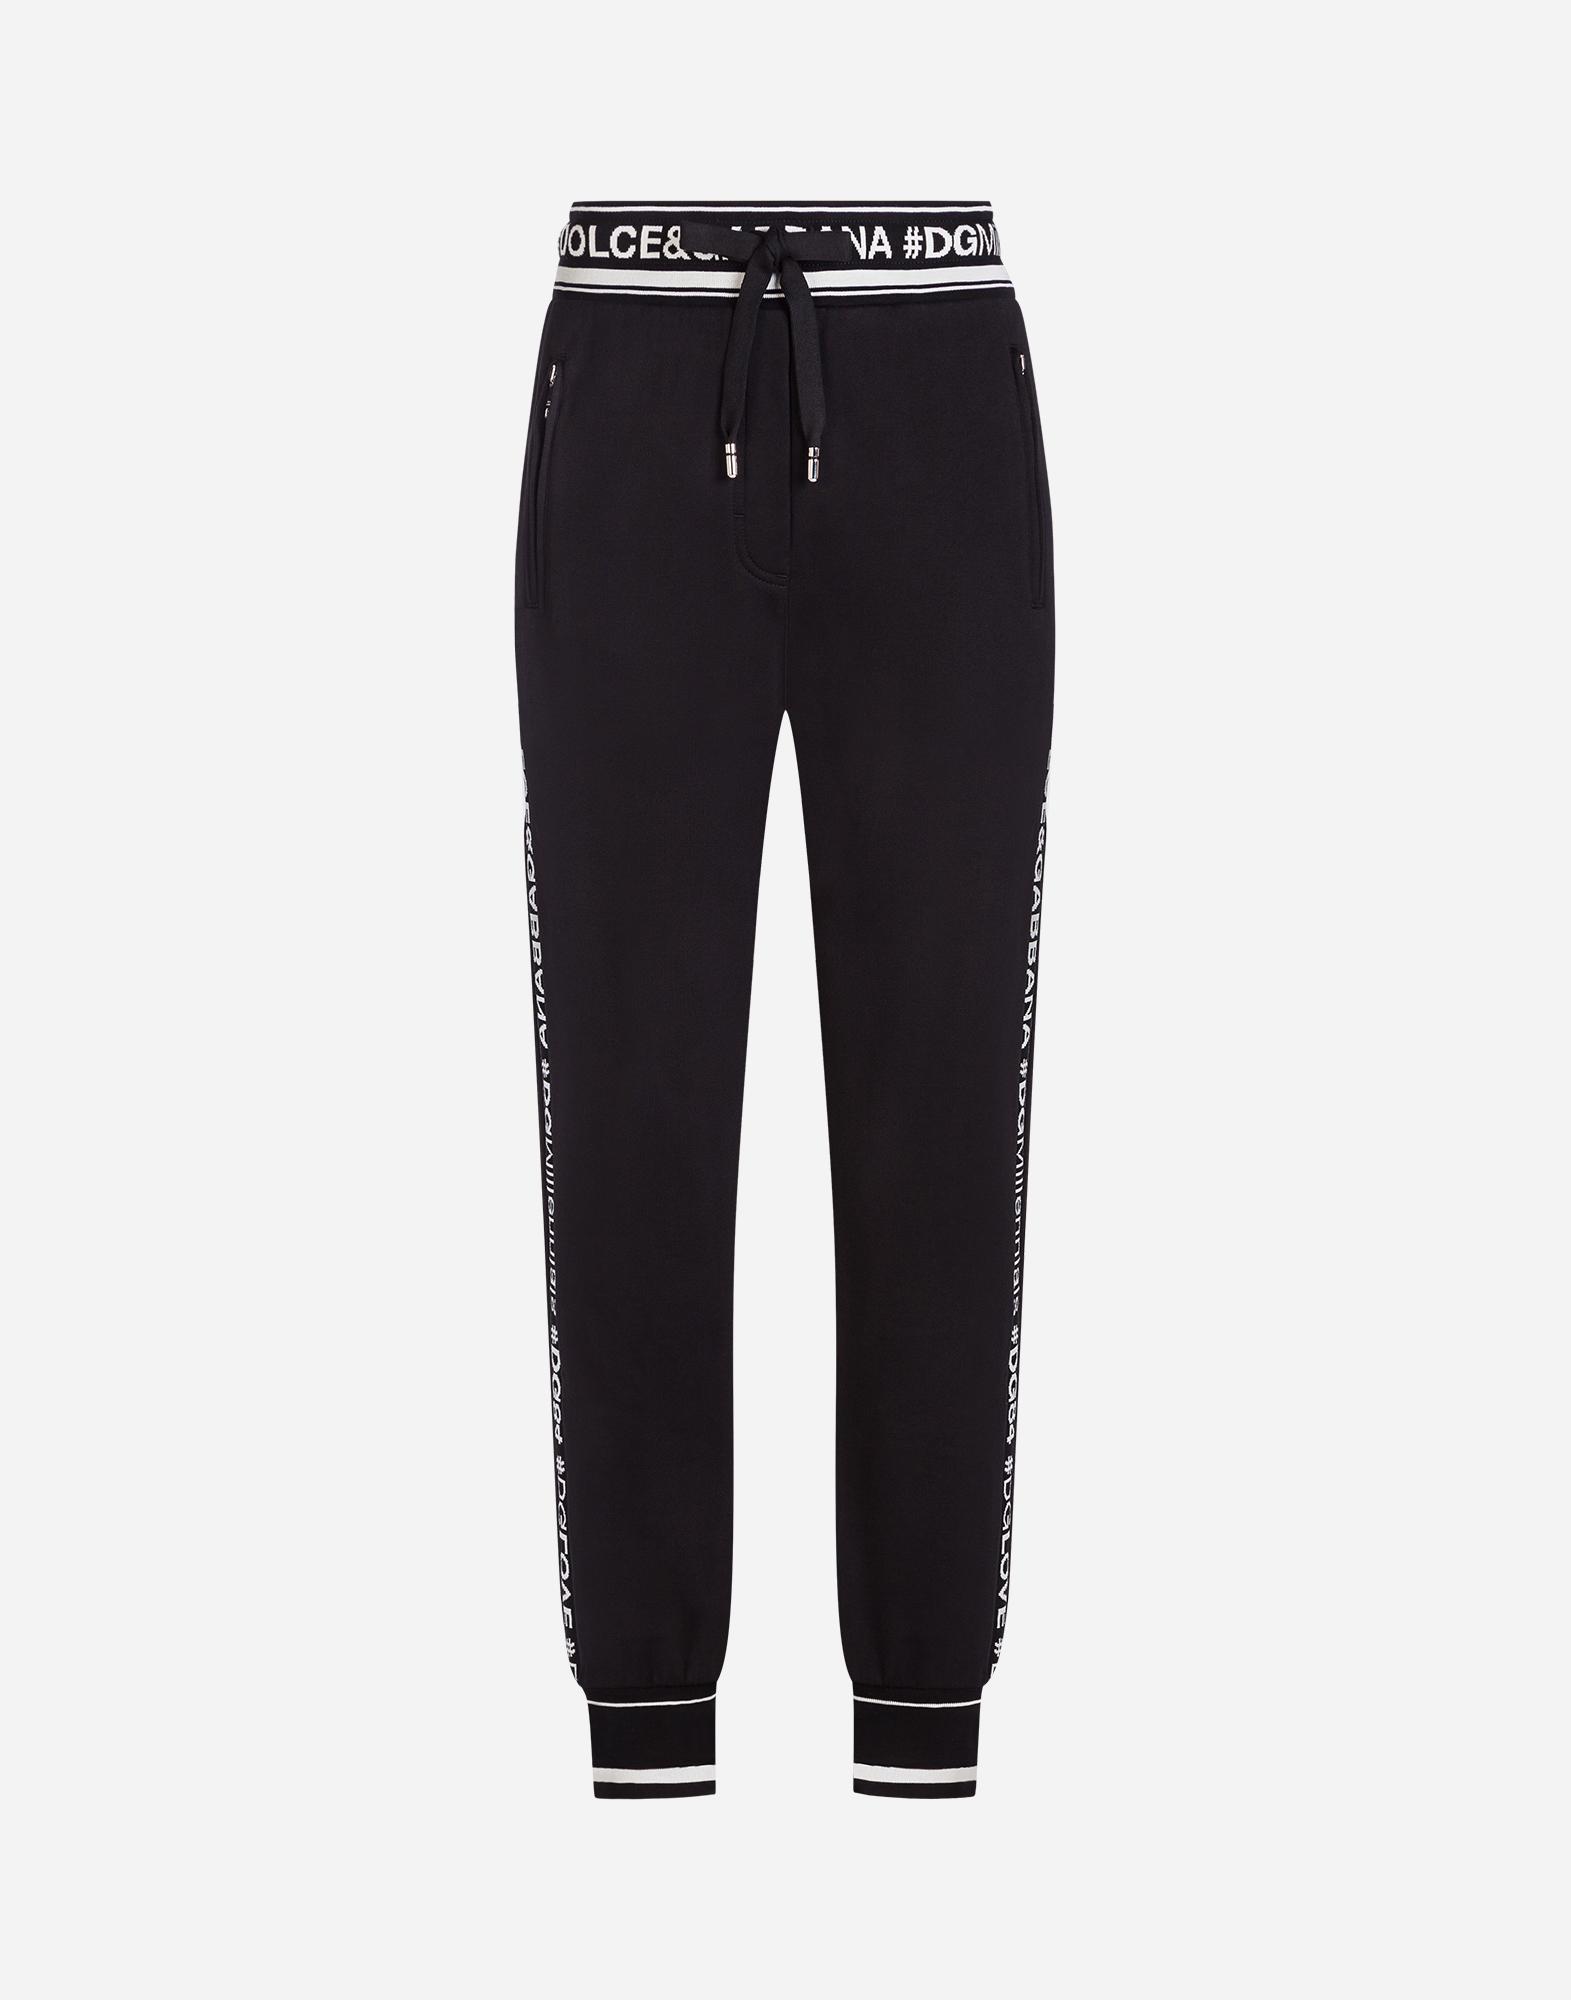 Dolce & Gabbana JERSEY PANTS